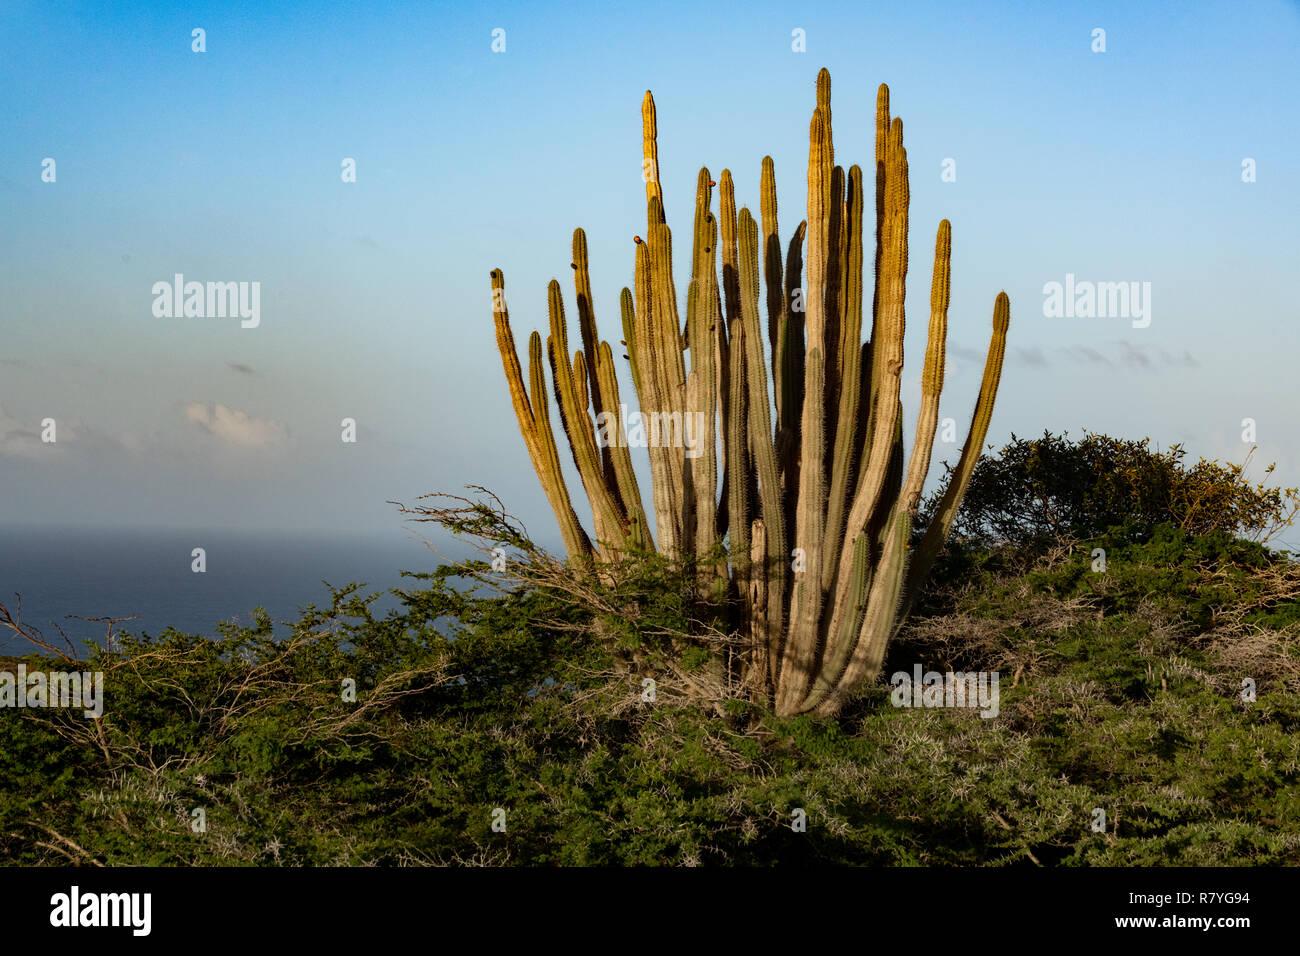 Aruba landscape - Stenocereus griseus cactus bush - a native Aruban plant at sunset - aka columnar cacti - Aruba desert landscape and Caribbean ocean - Stock Image